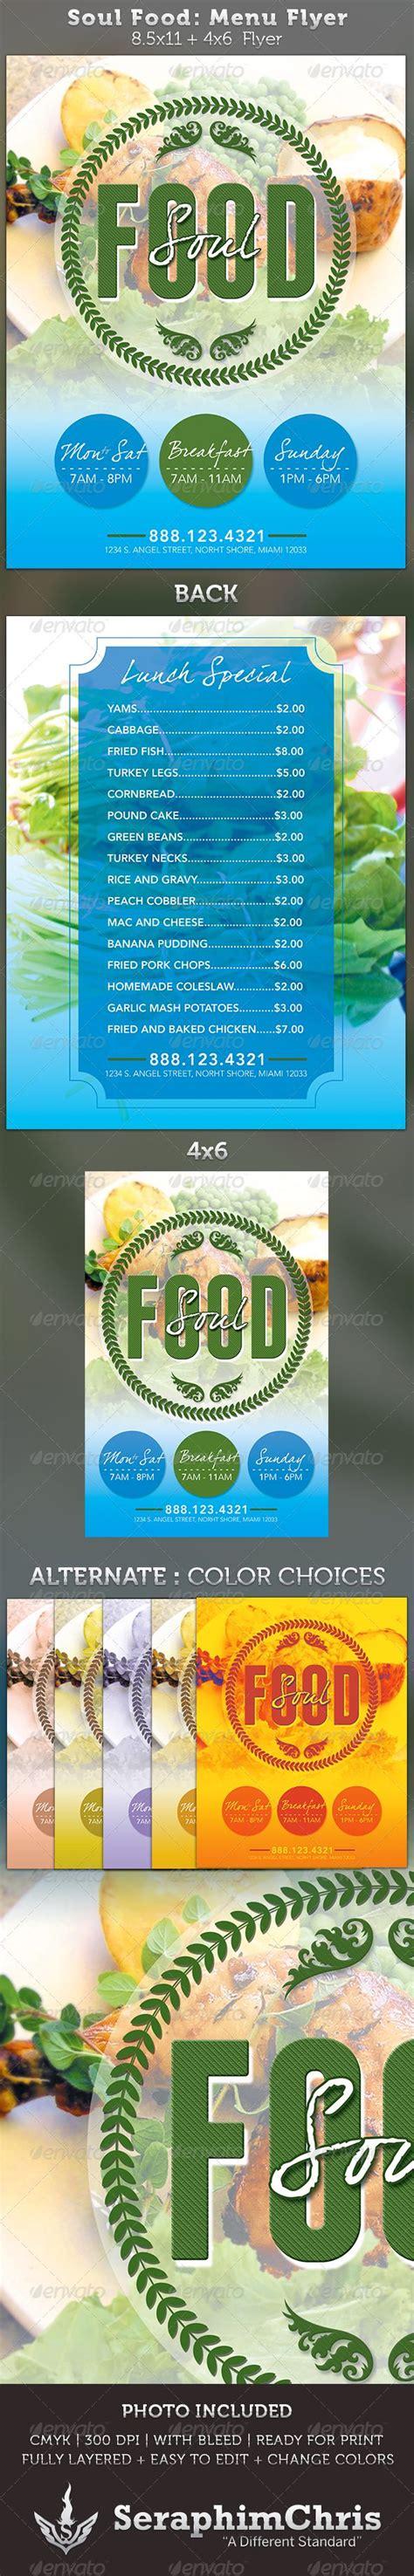 menu poster template 60 premium restaurant menu templates dzineflip